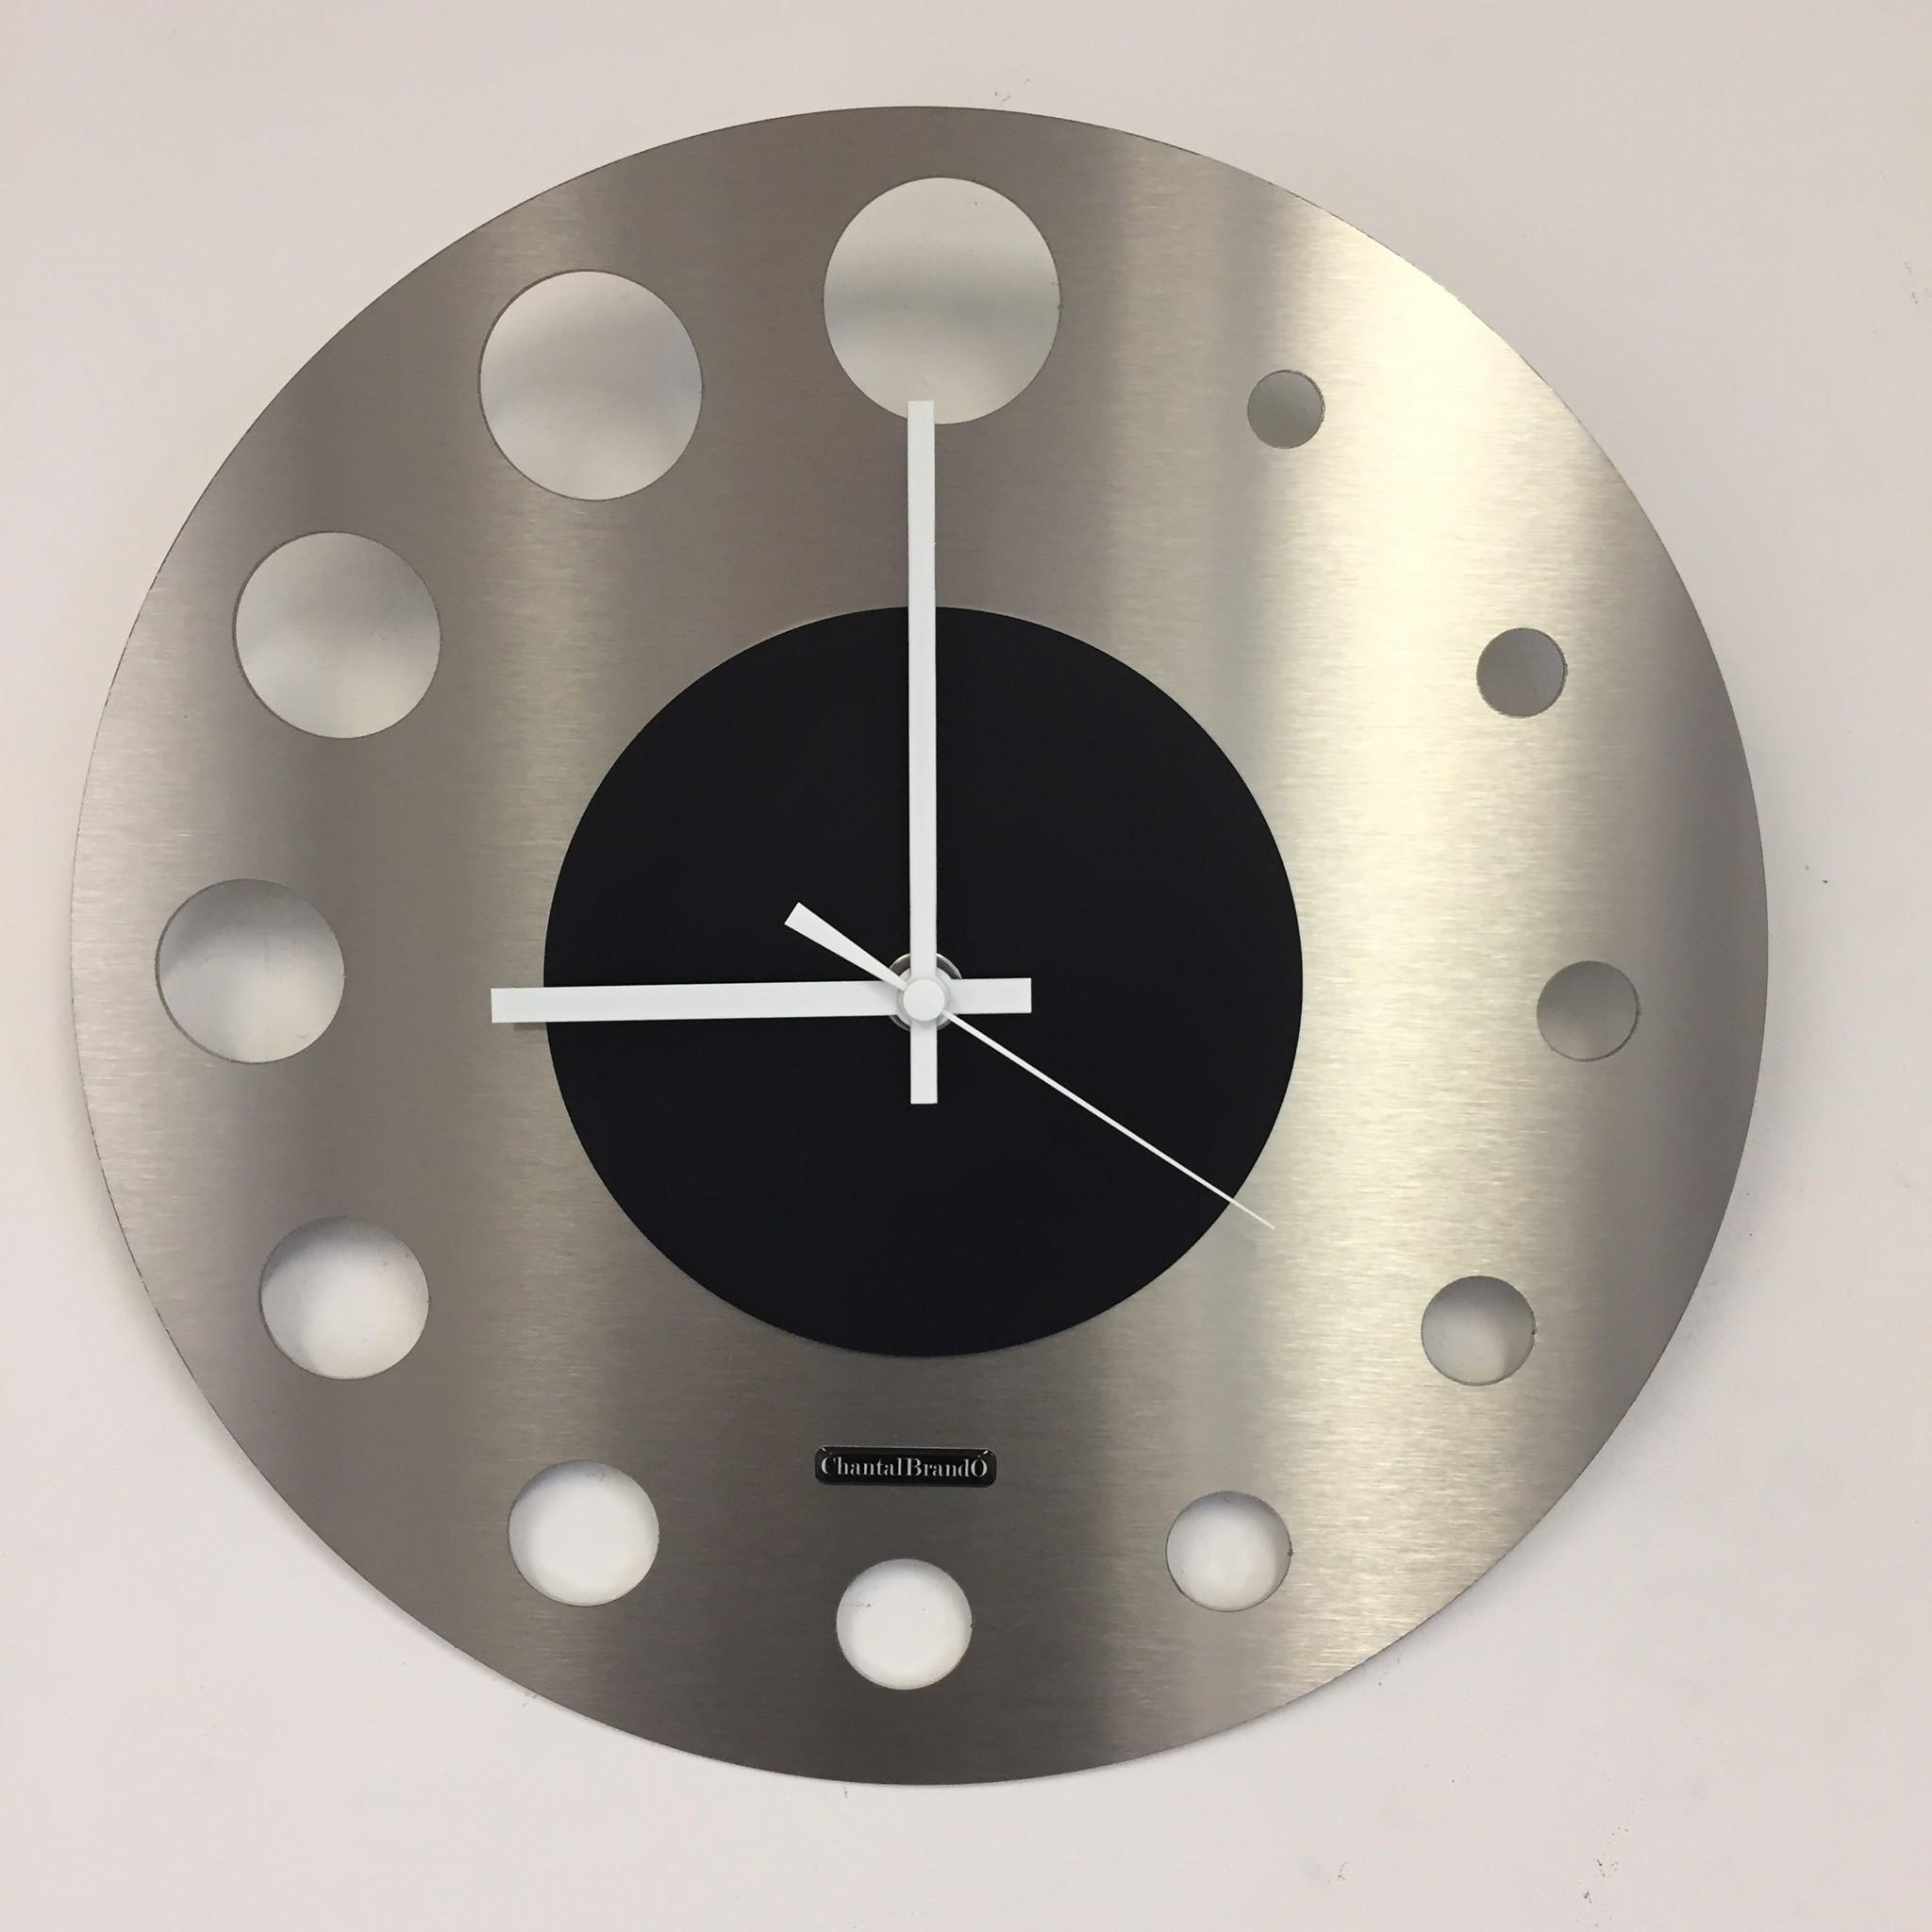 ChantalBrandO Wandklok JUNTE BRUSSEL ATOMIUM Black Modern Design